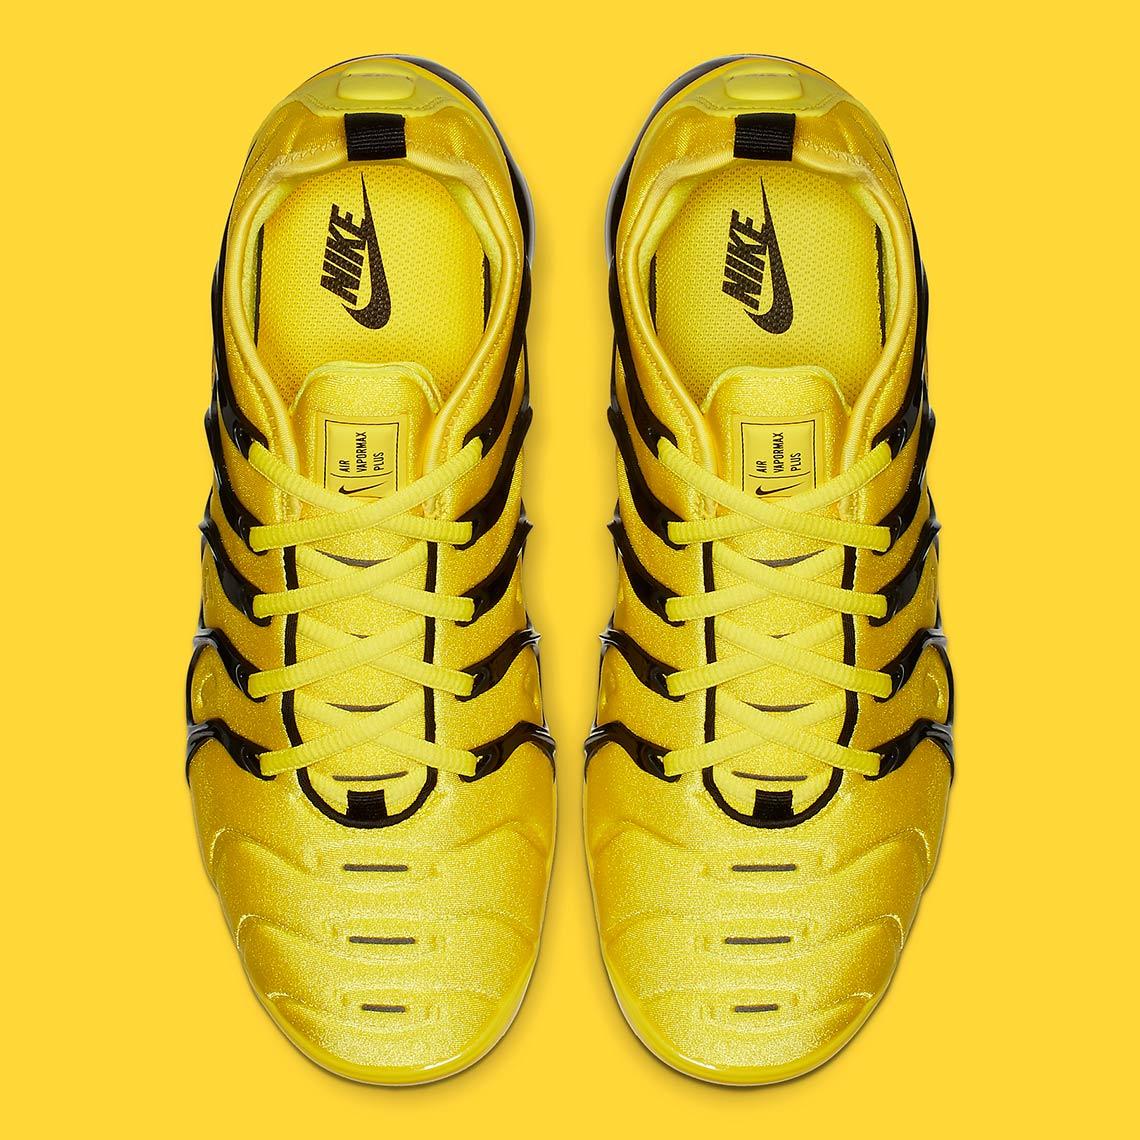 2cc5aeb13b69a4 Nike Vapormax Plus Yellow Black BV6079-700 Info